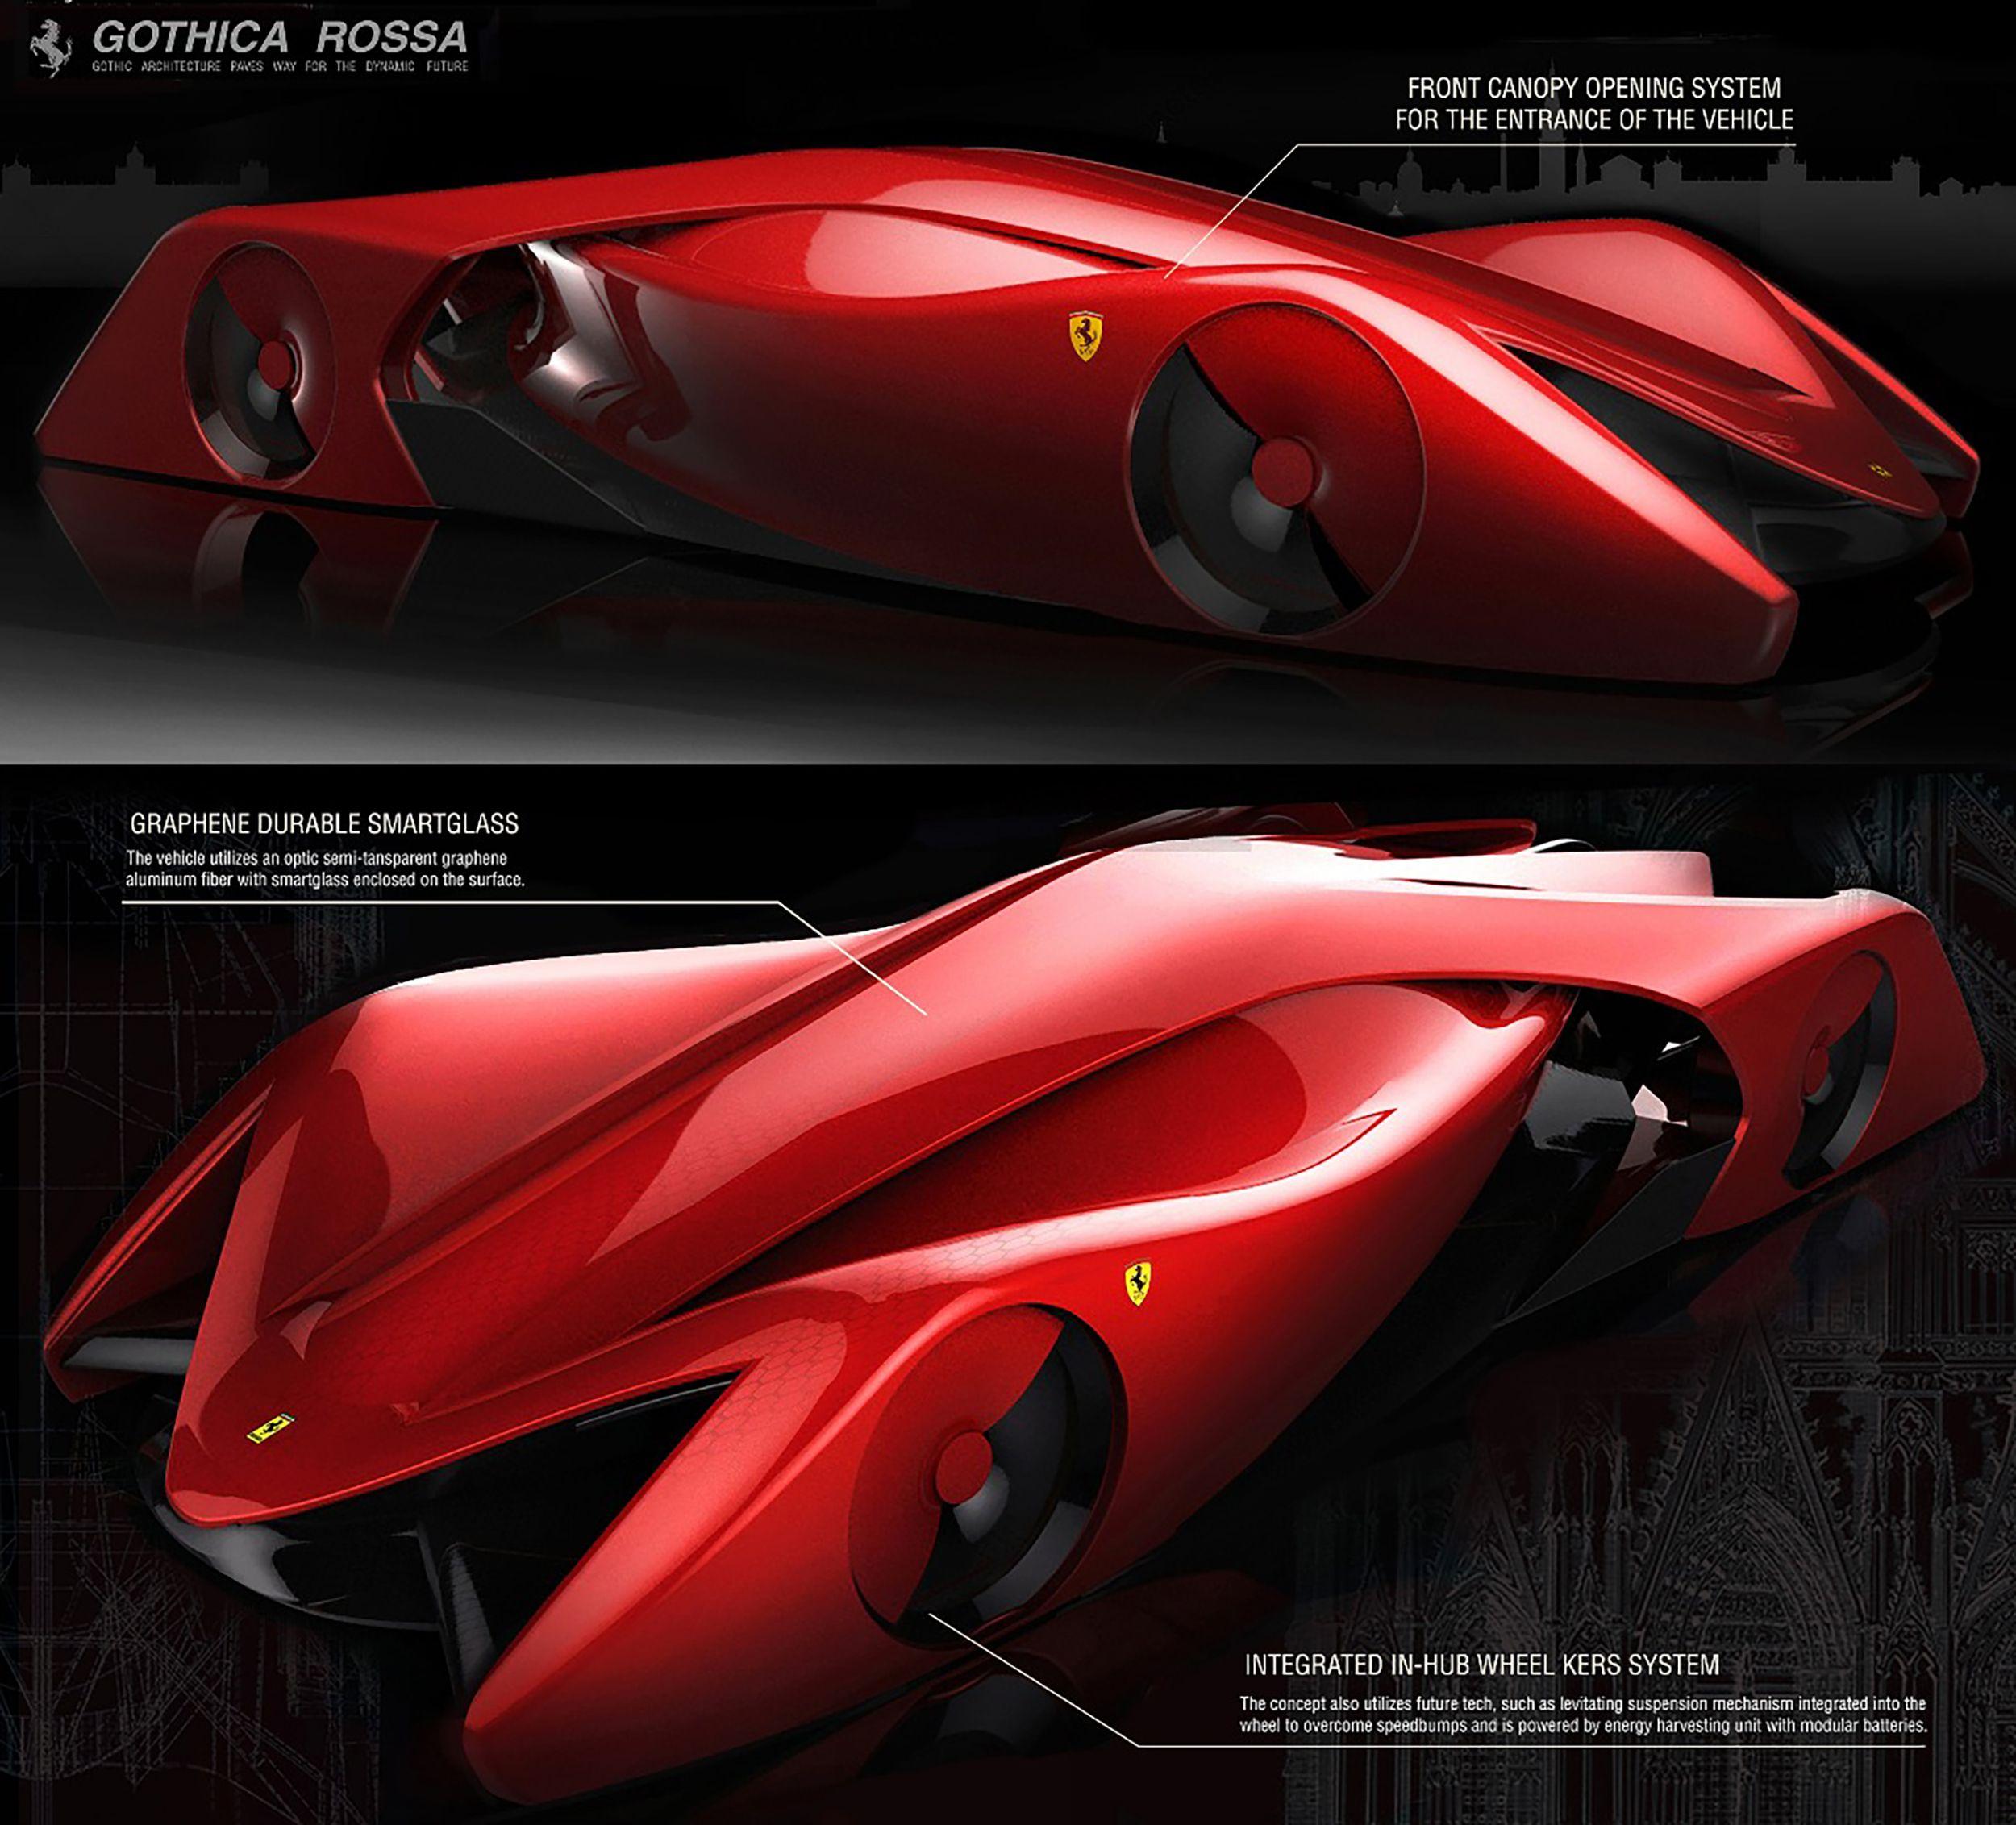 Future Elegance에 대한 이미지 검색결과 Super Cars Concept Cars Futuristic Cars